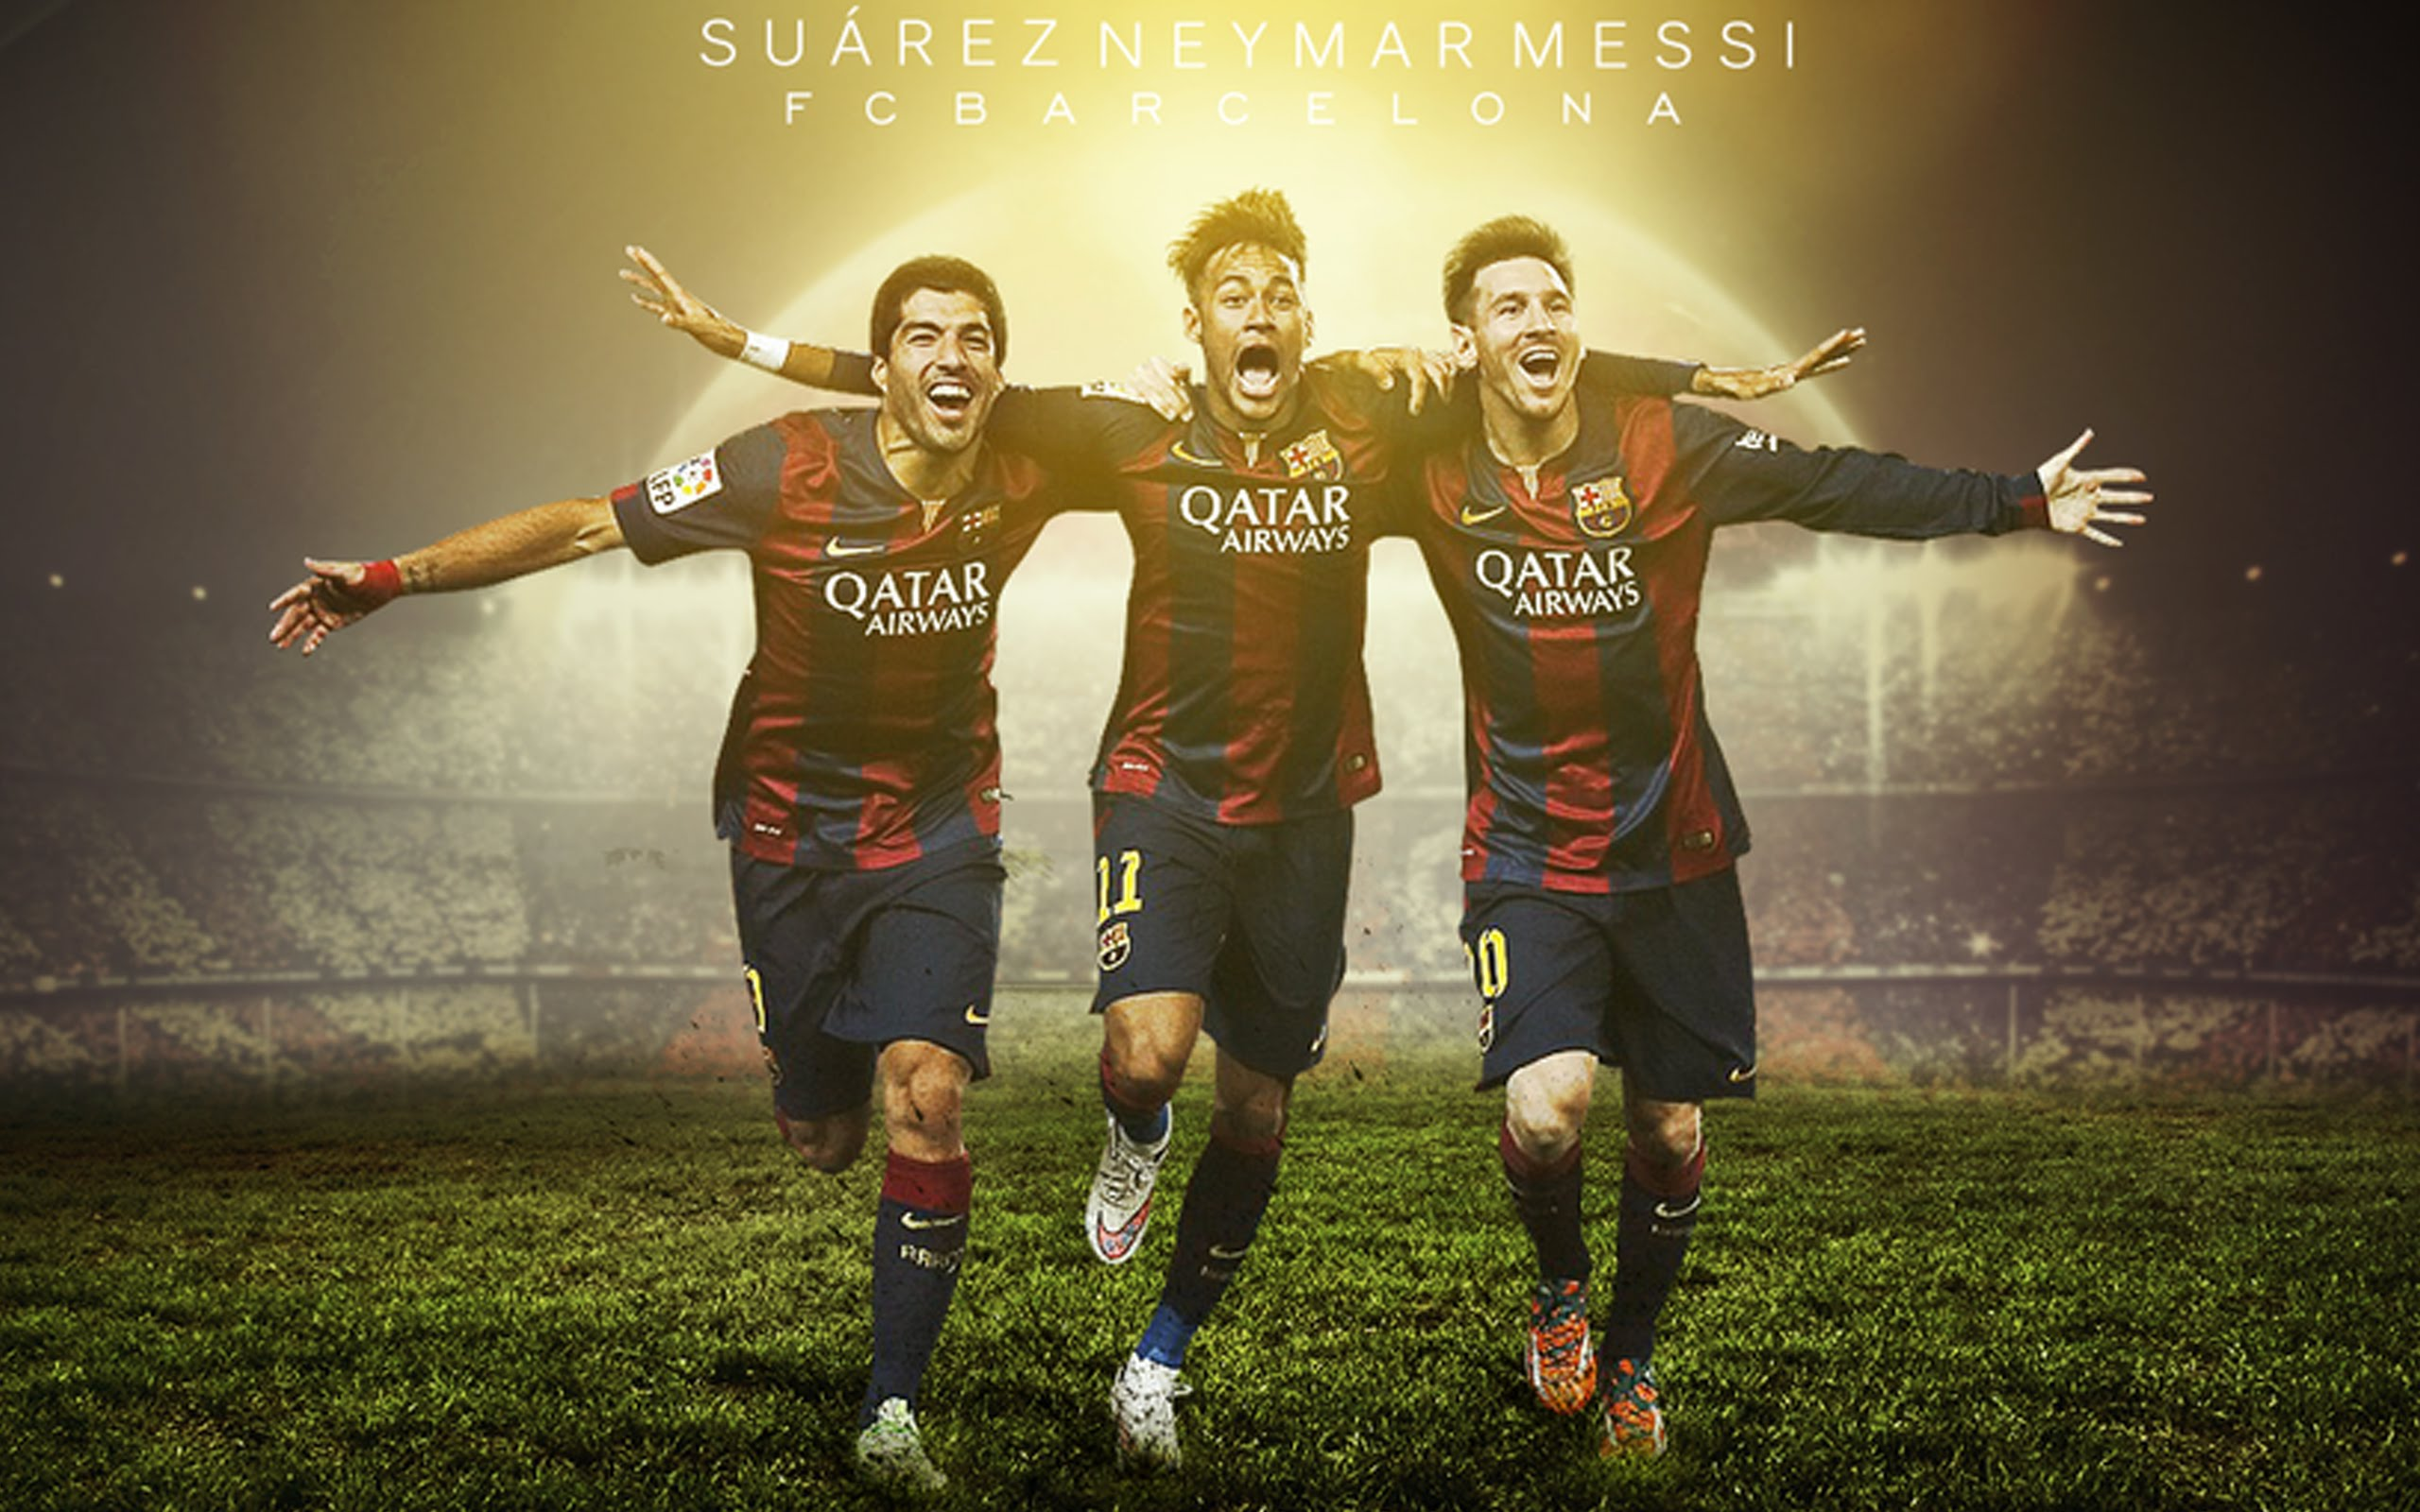 messi neymar suarez wallpaper 2021